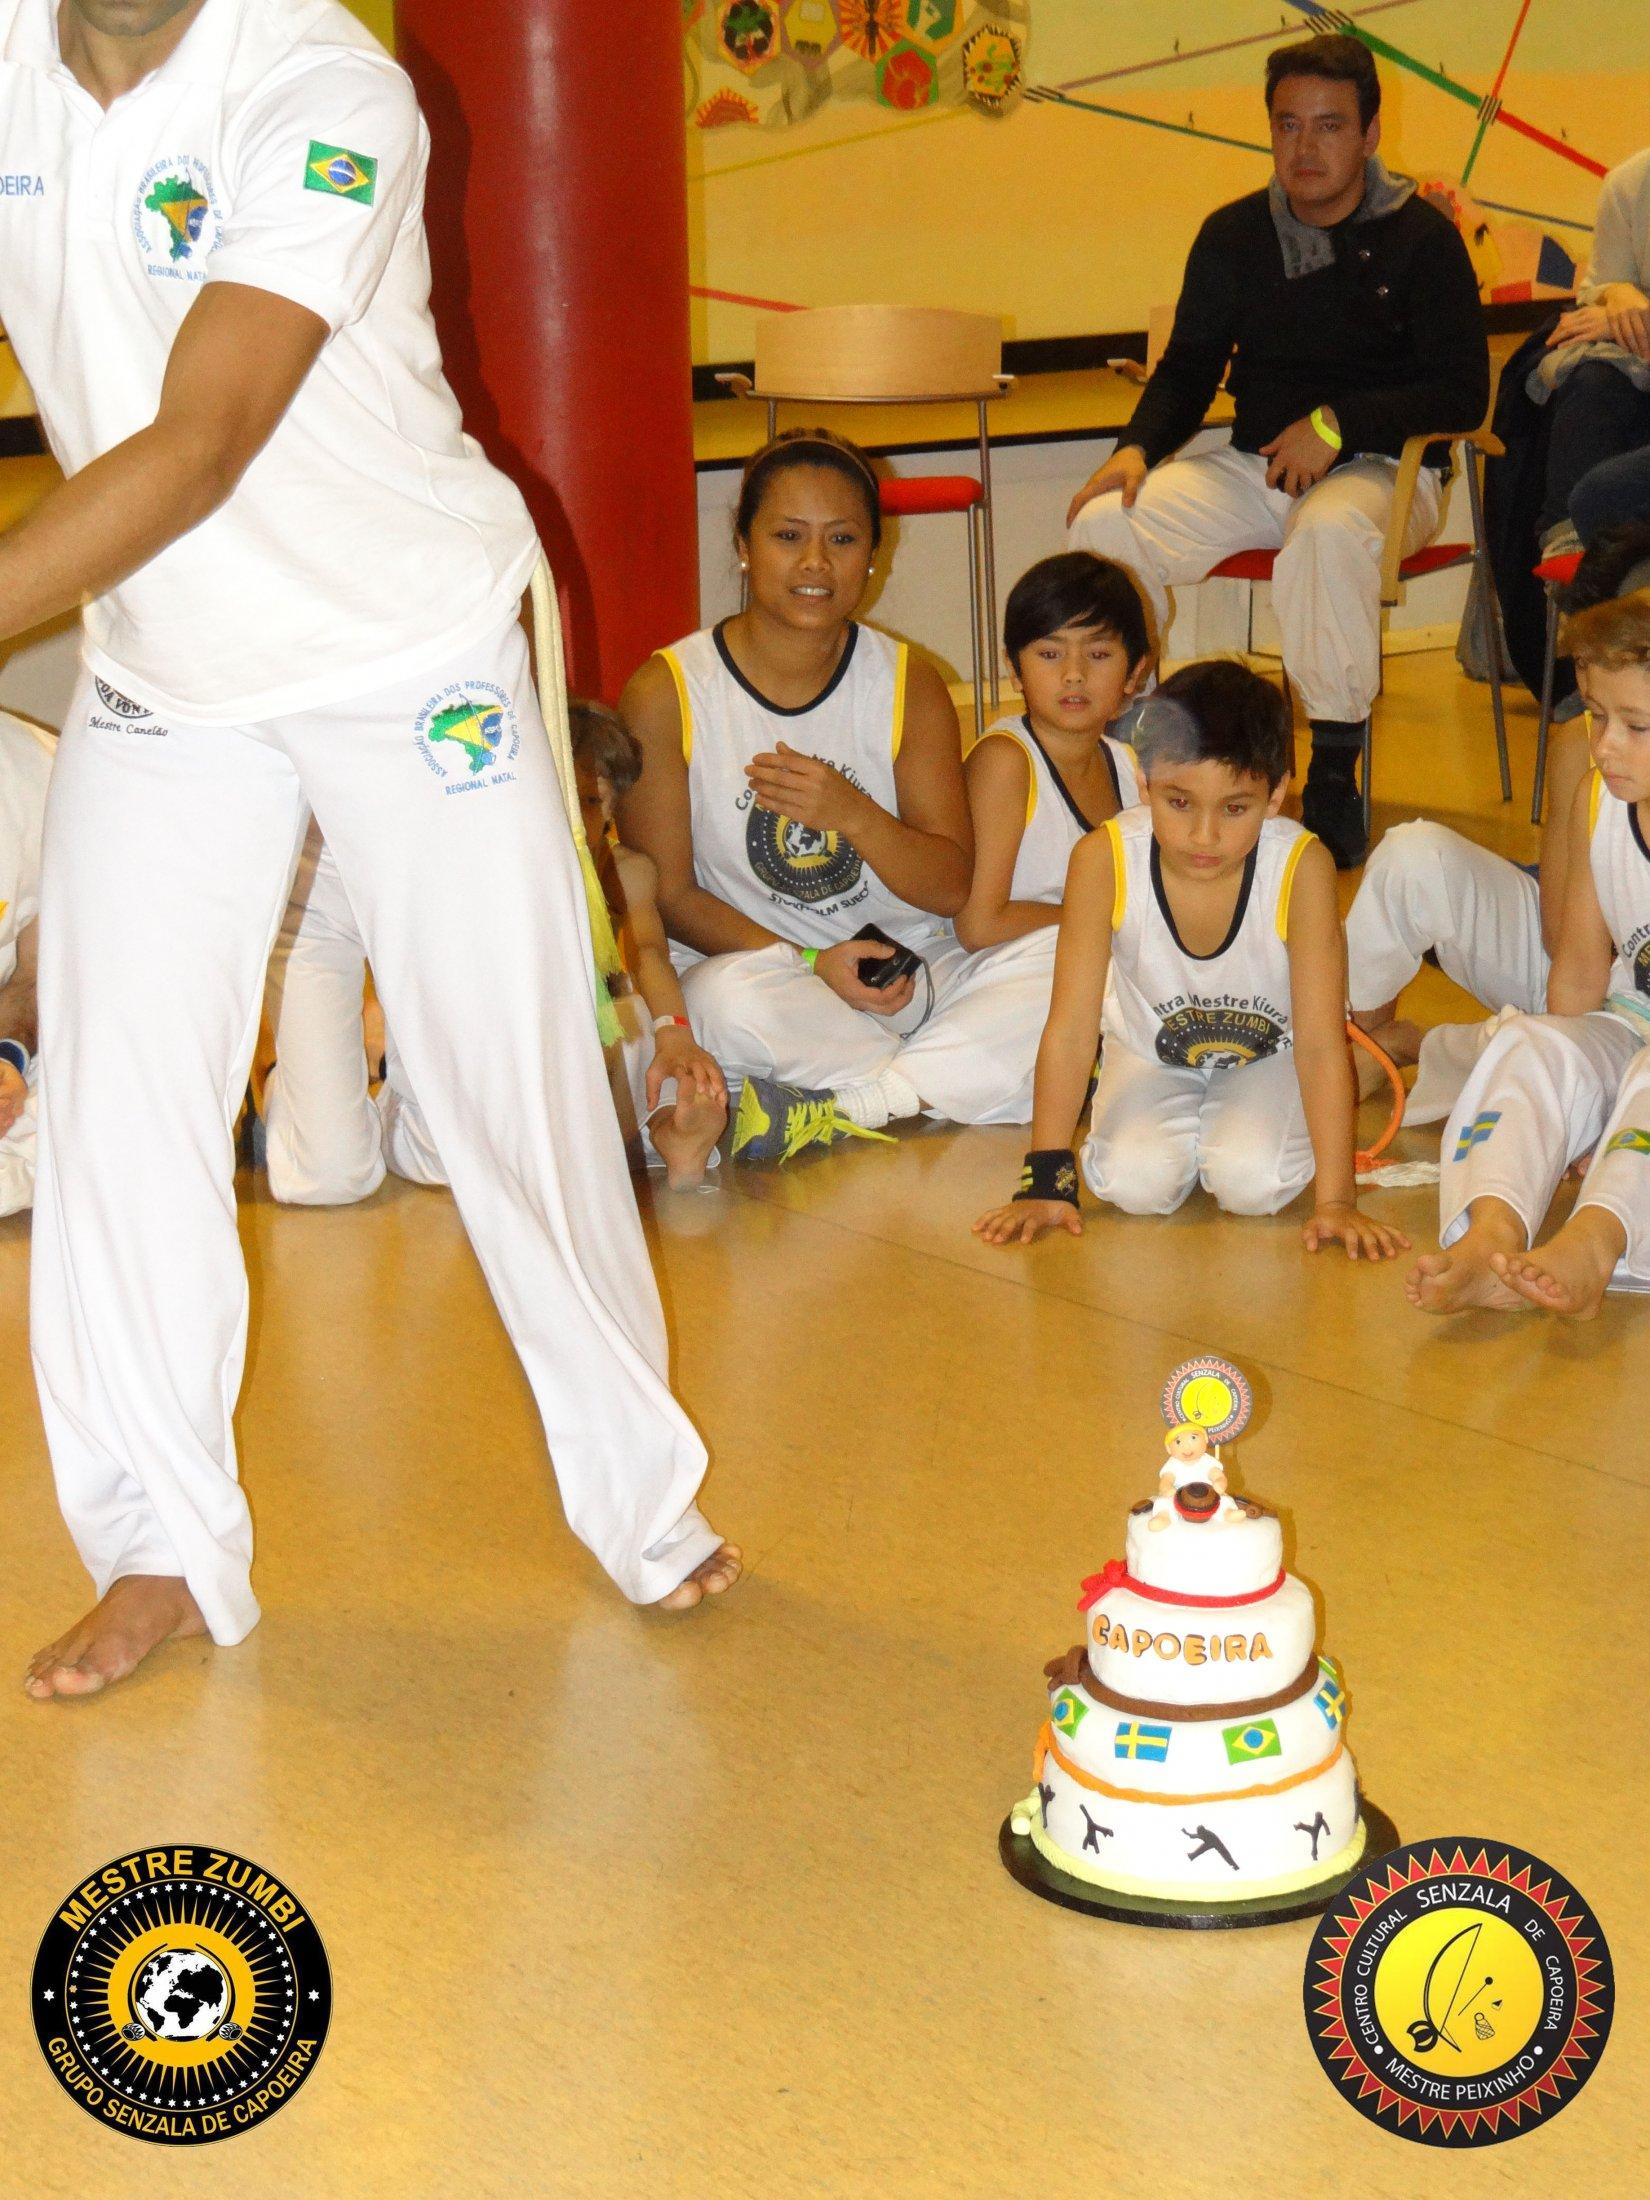 2013-12-14 - Capoeira 104